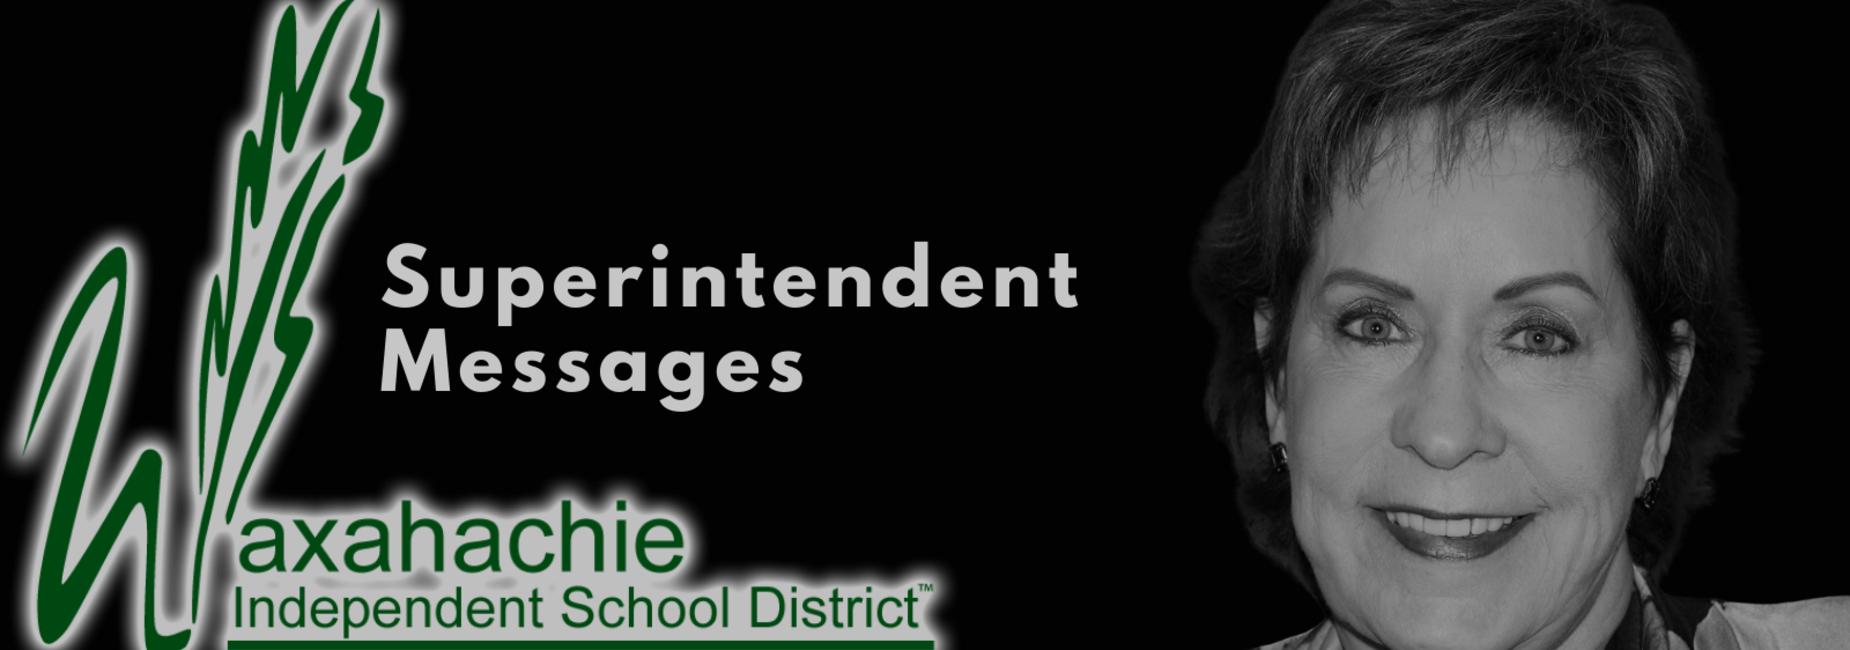 headshot of superintendent